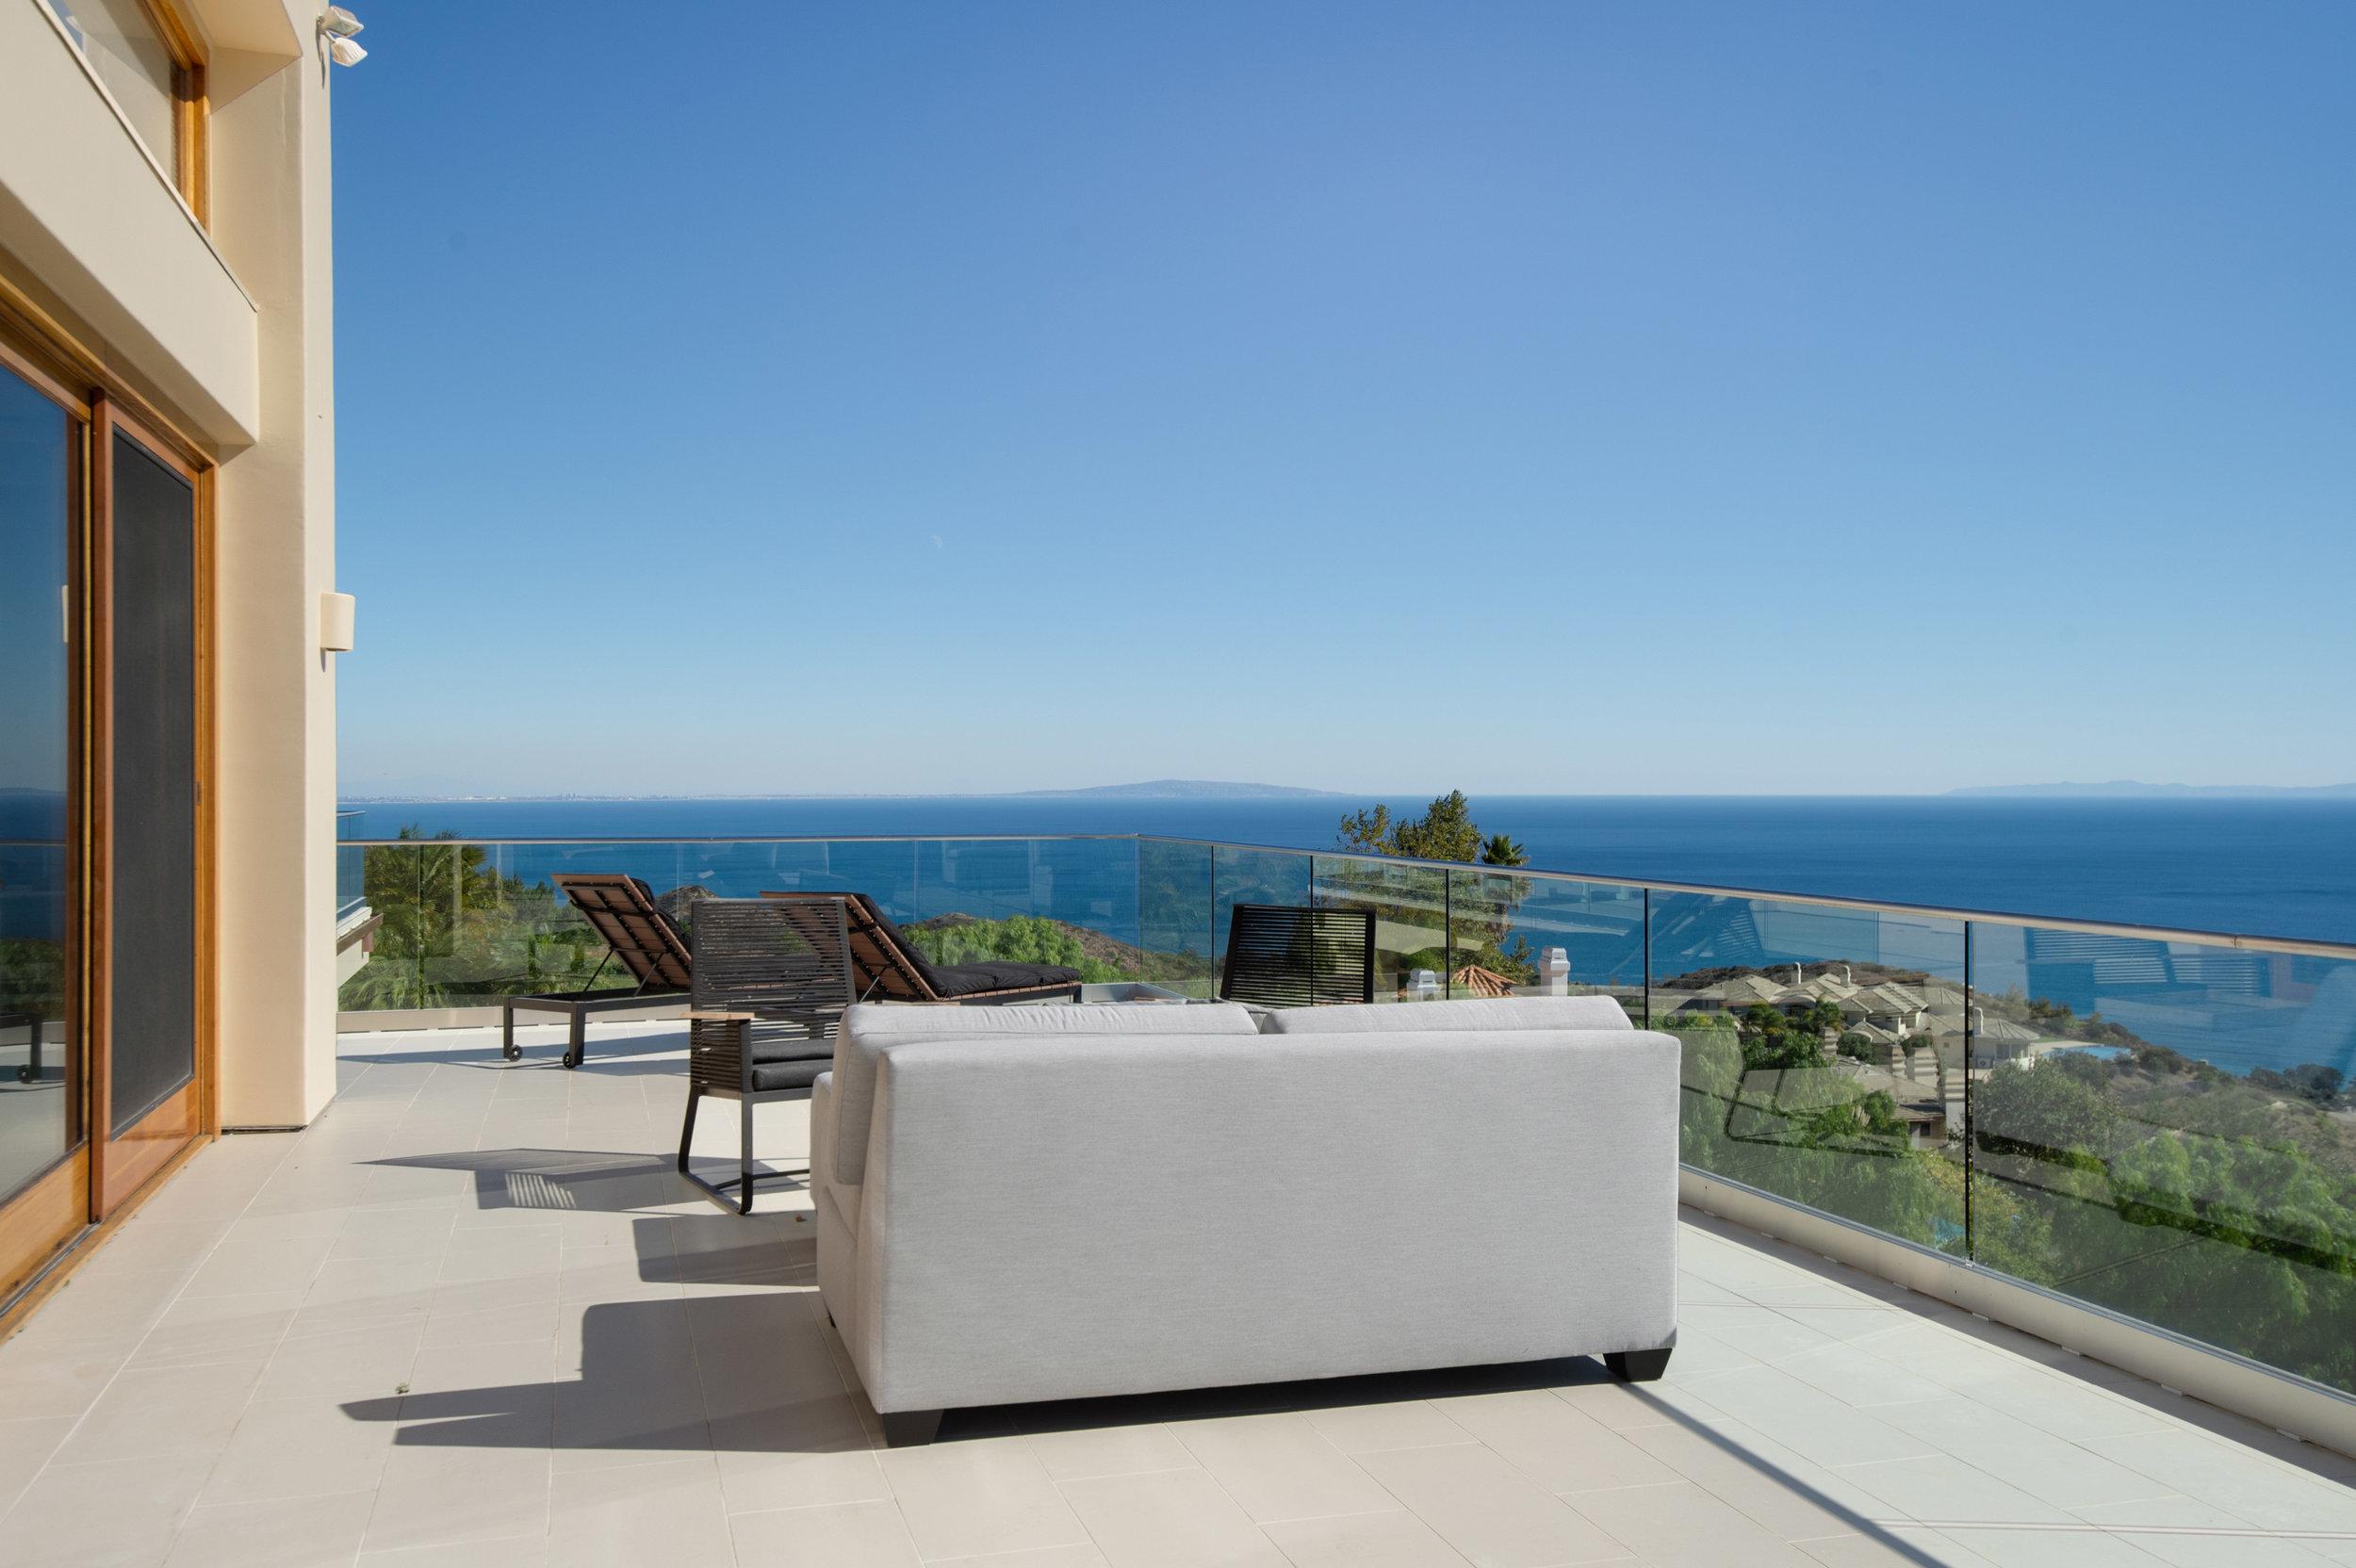 002 Deck Ocean View 27475 Latigo Bay View Drive For Sale Lease The Malibu Life Team Luxury Real Estate.jpg